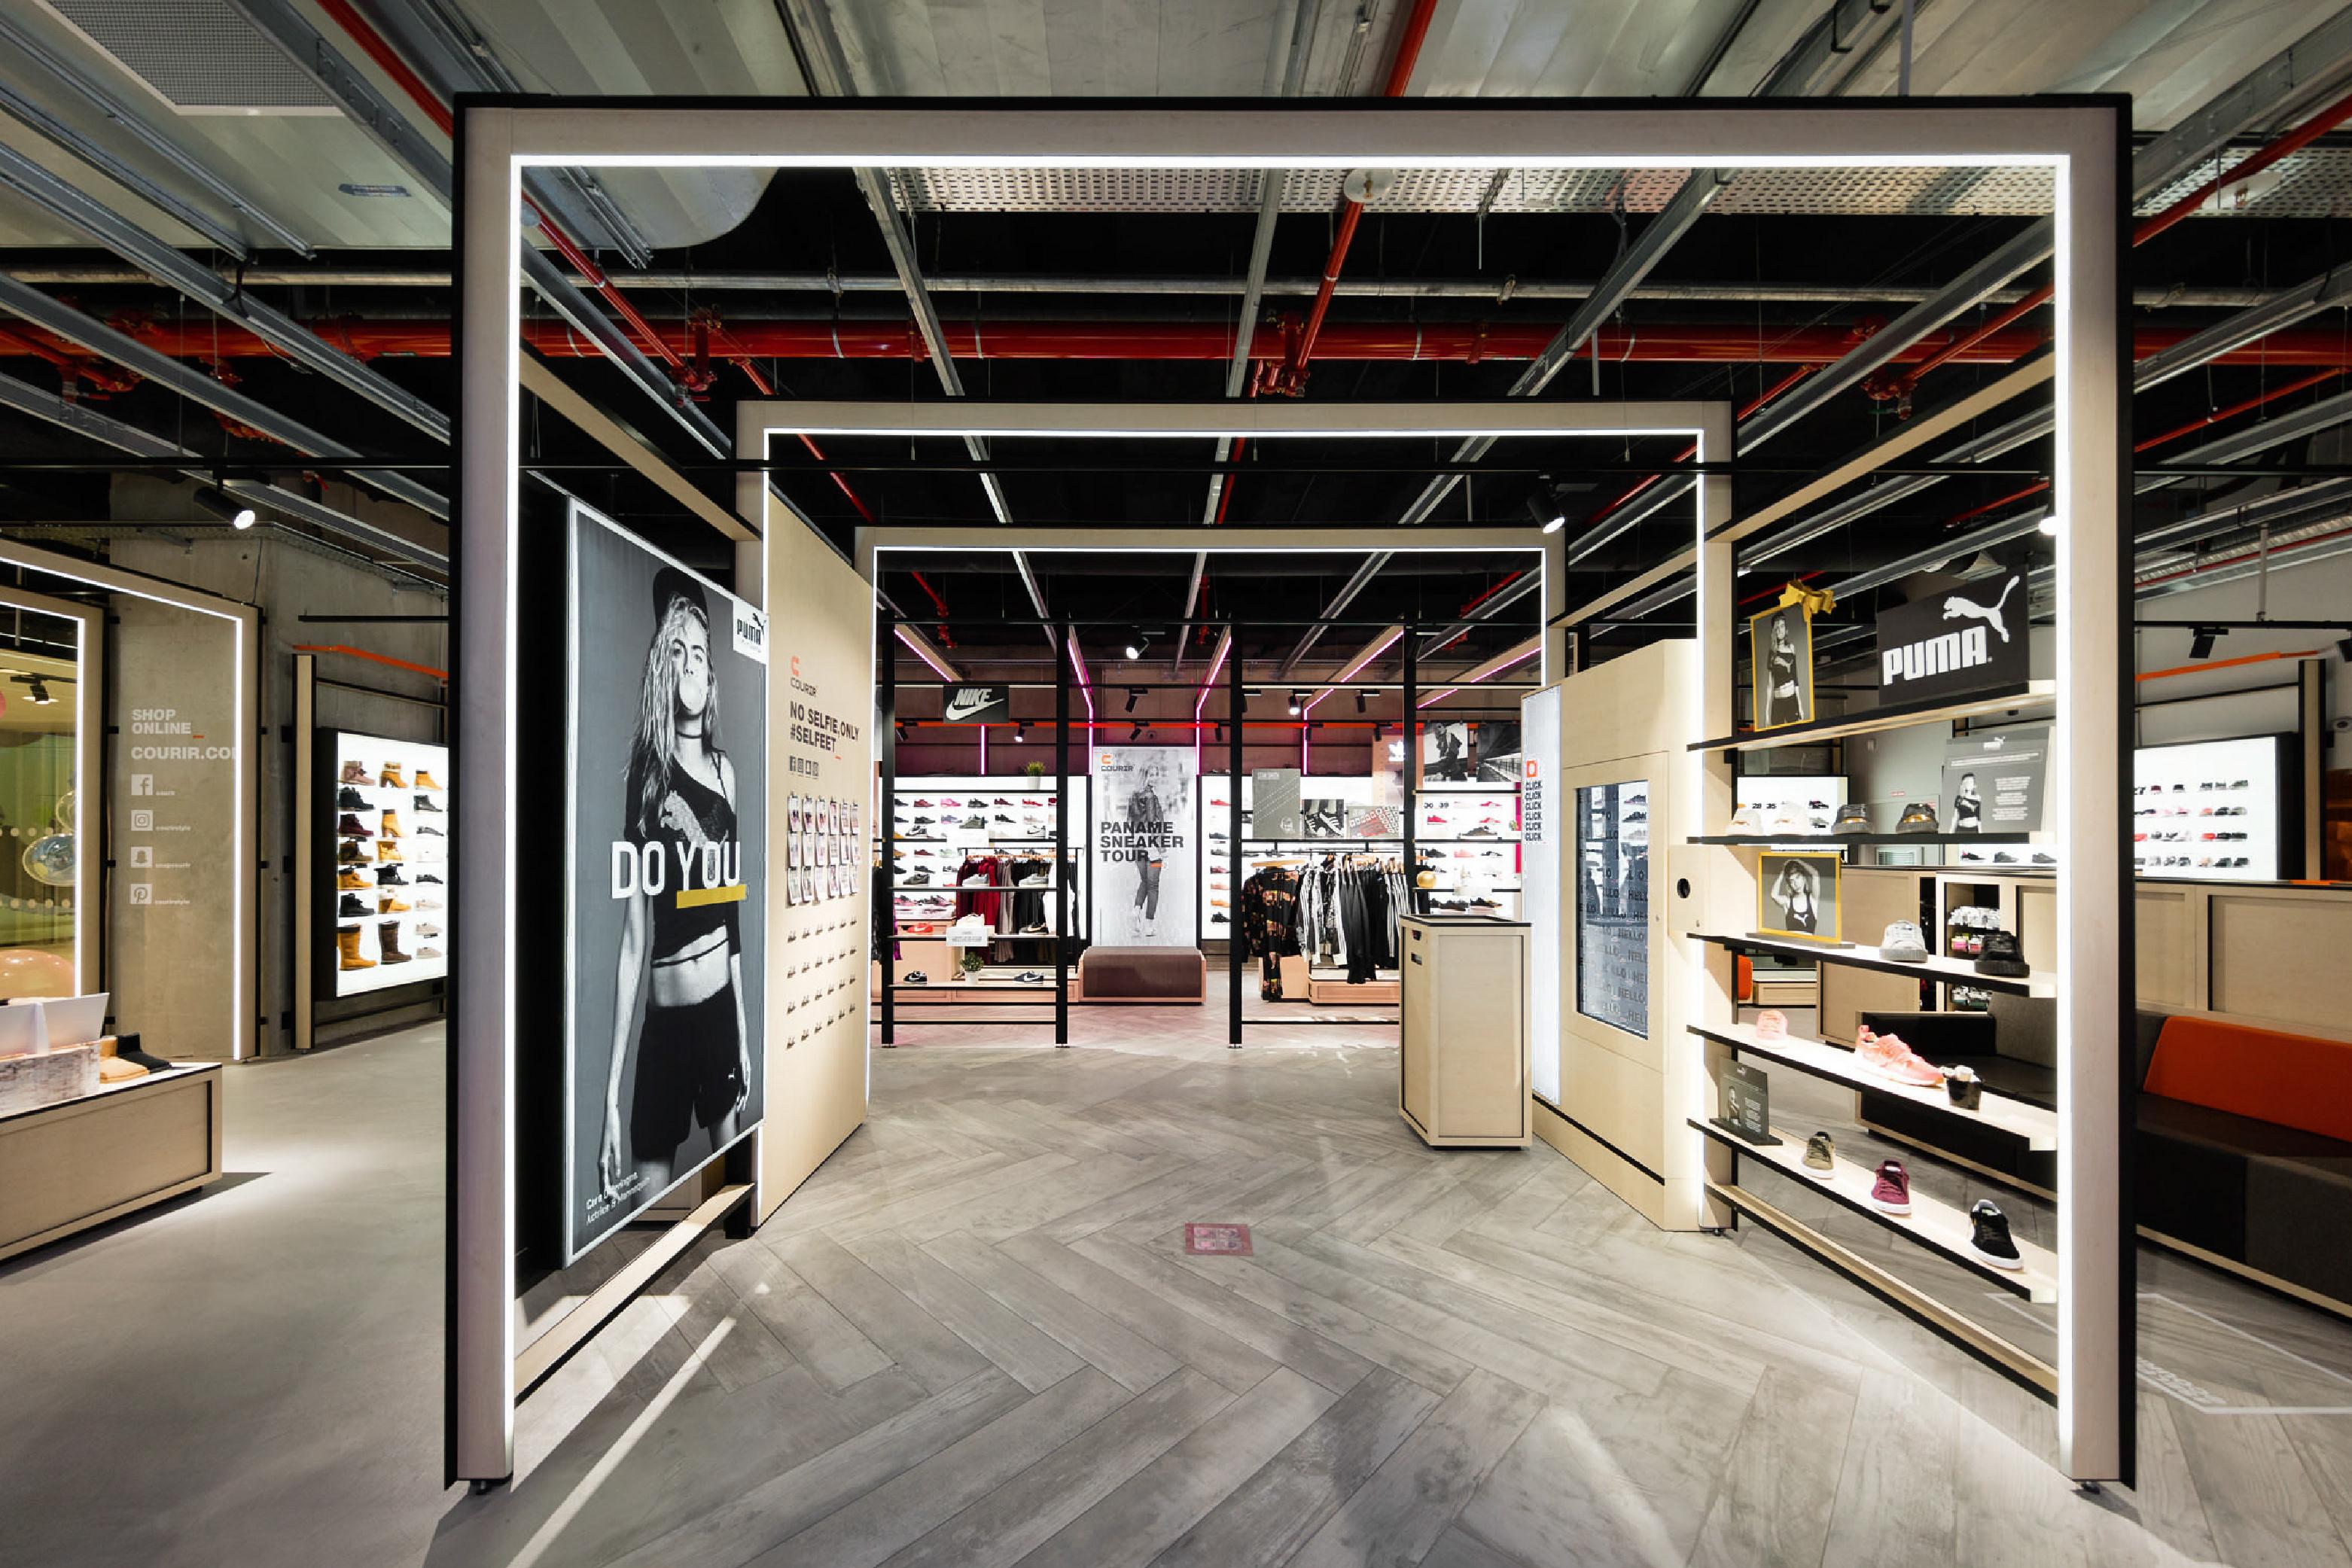 carr noir courir branding retail design. Black Bedroom Furniture Sets. Home Design Ideas